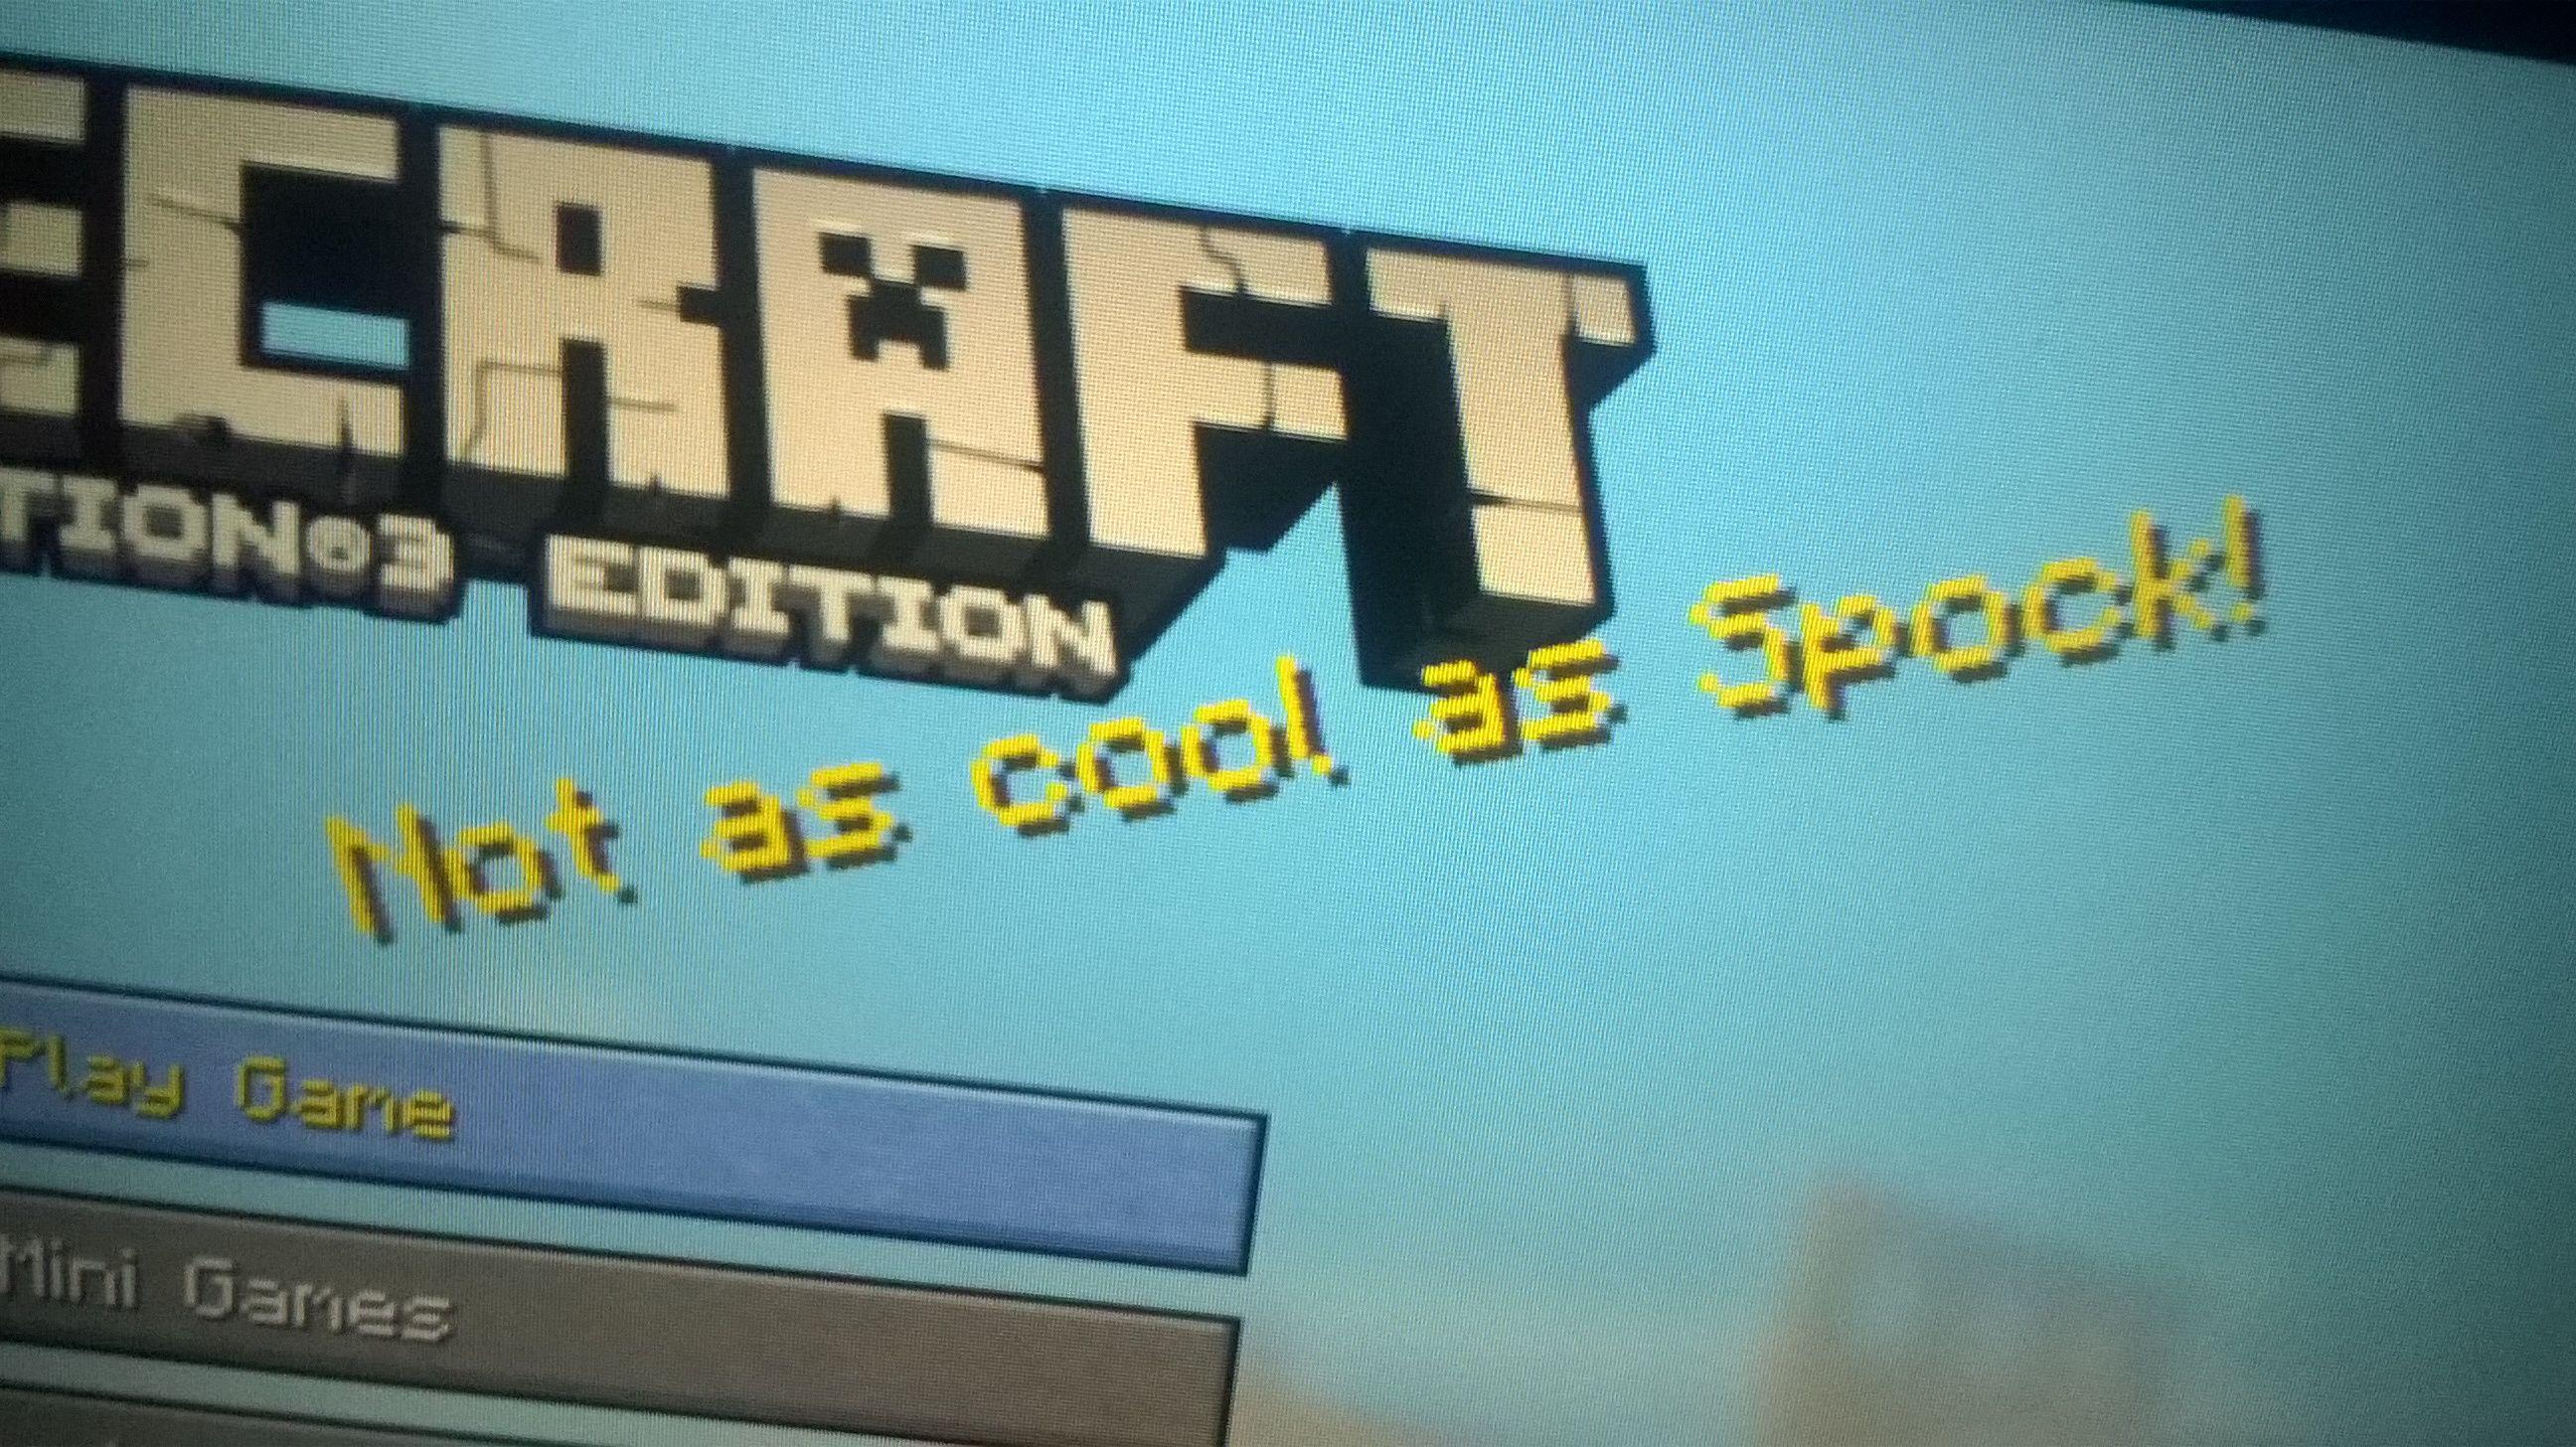 Minecraft Knows! Spock rocks.